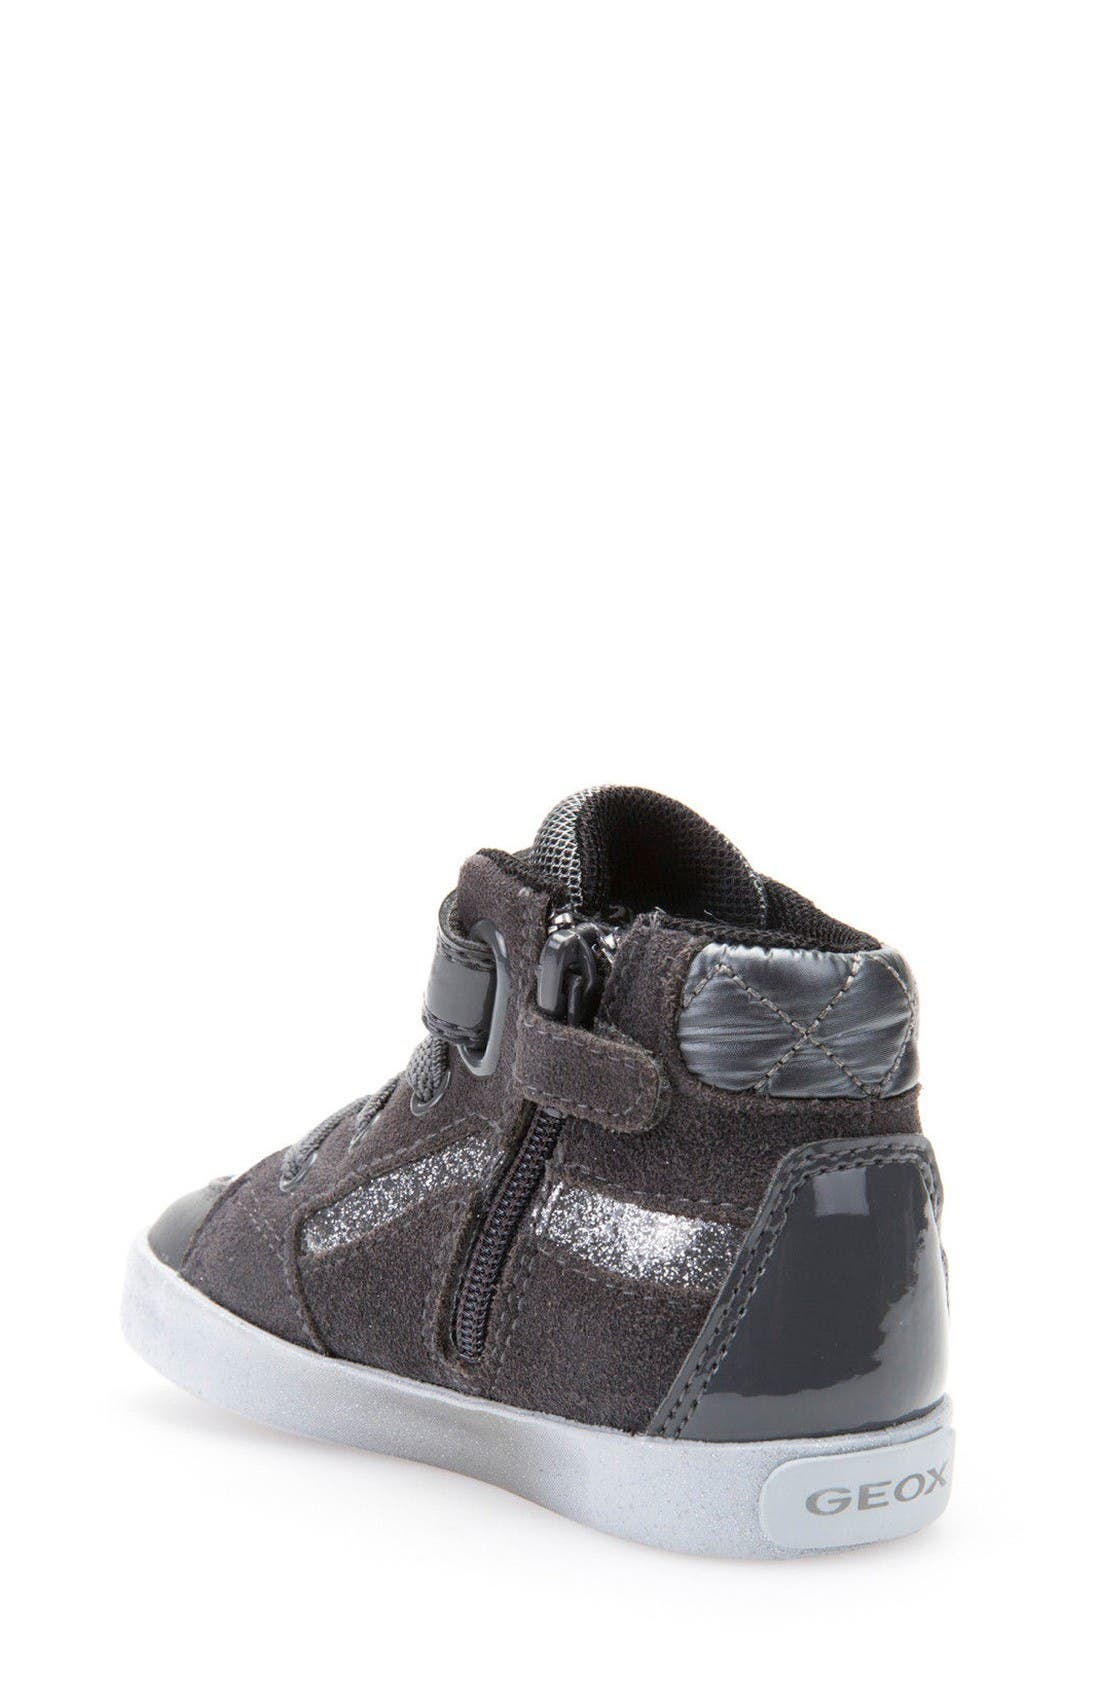 Alternate Image 2  - Geox Kiwi Studded High Top Sneaker (Walker & Toddler)